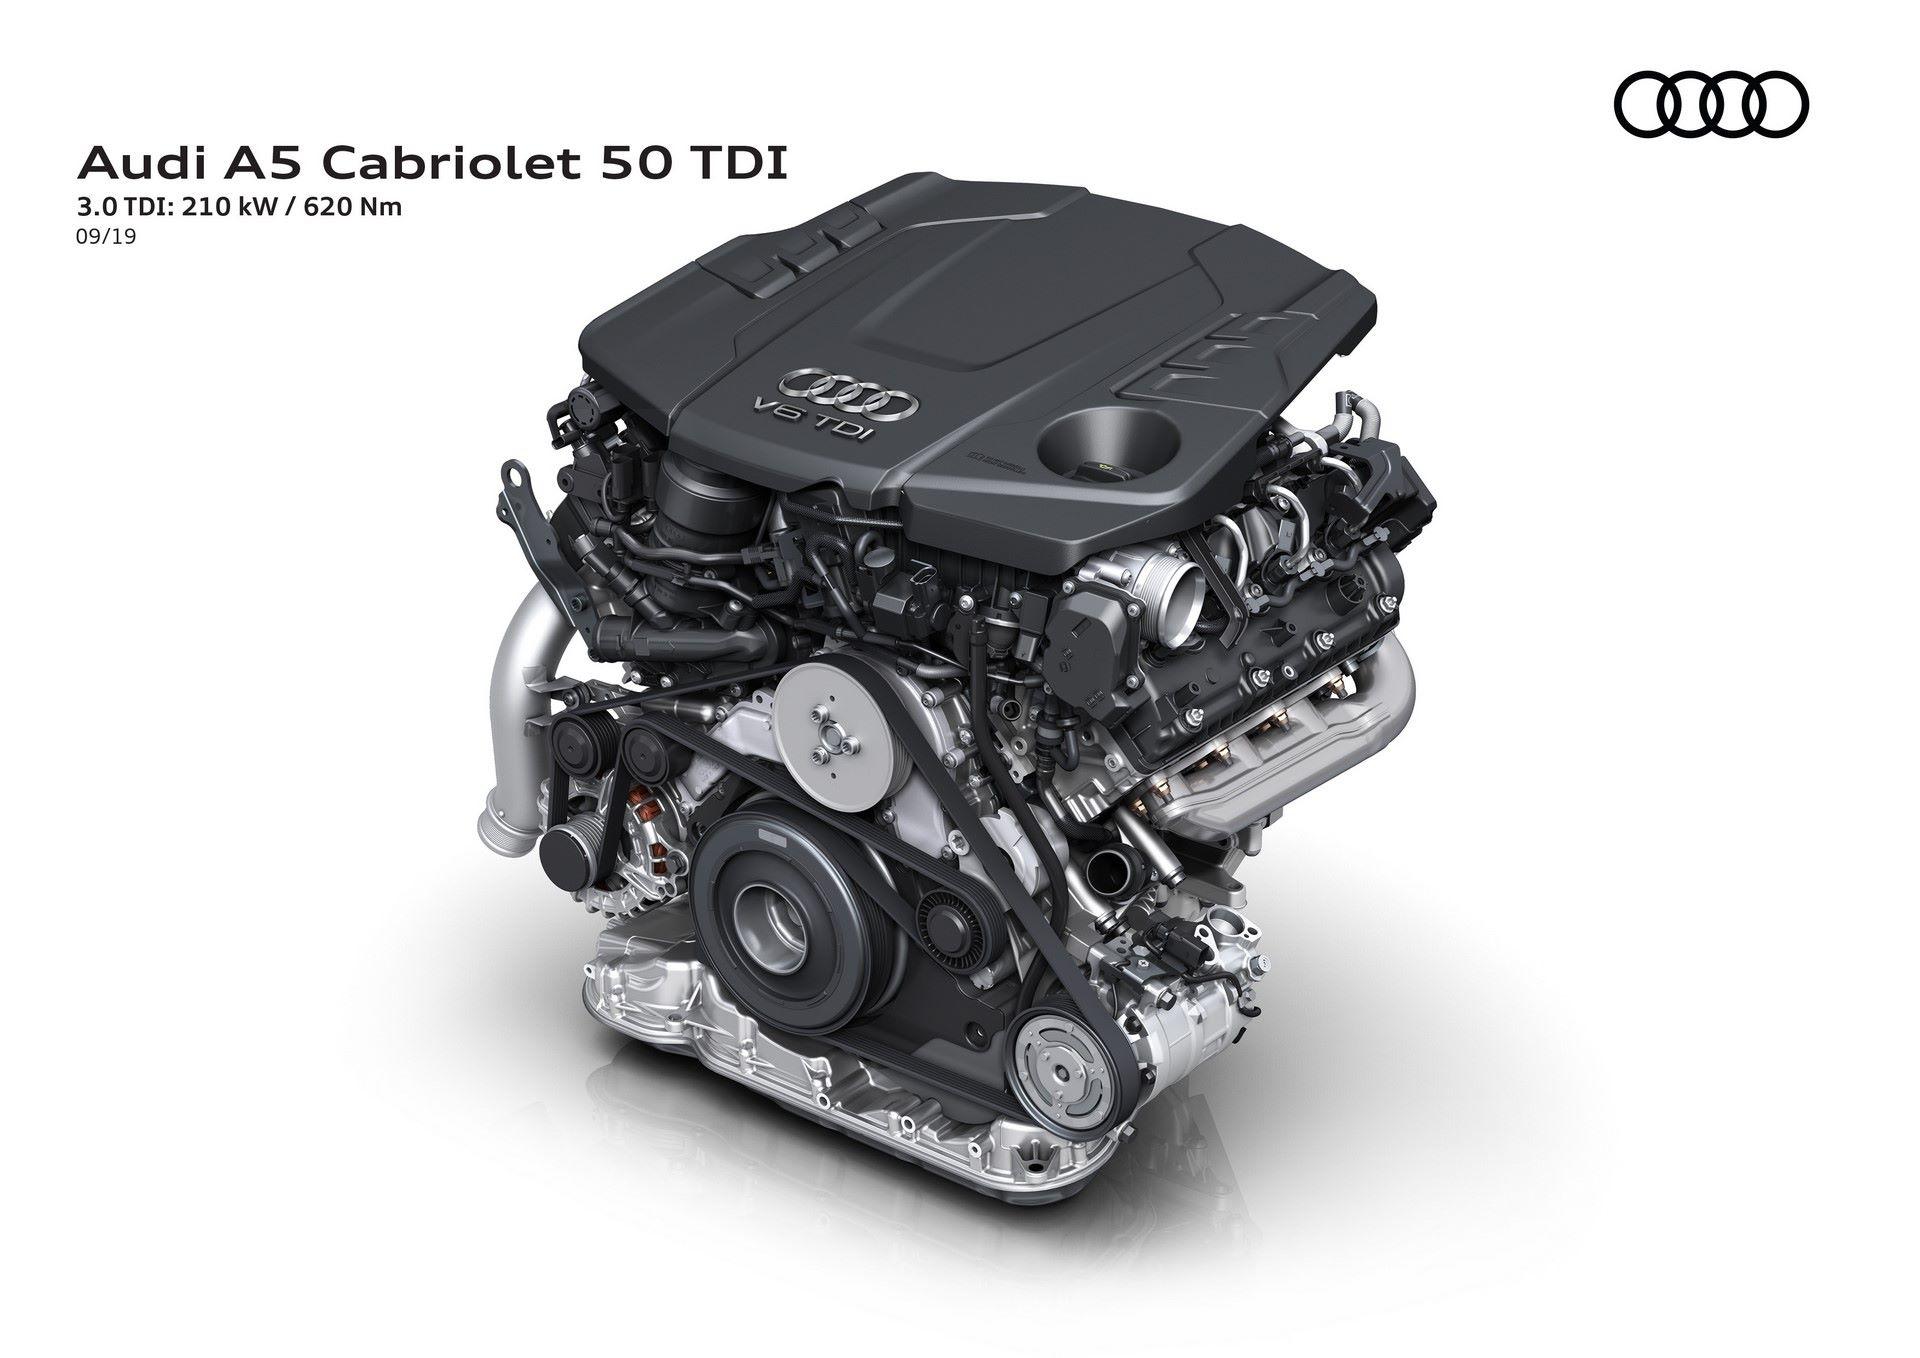 Audi A5 Cabriolet 50 TDI